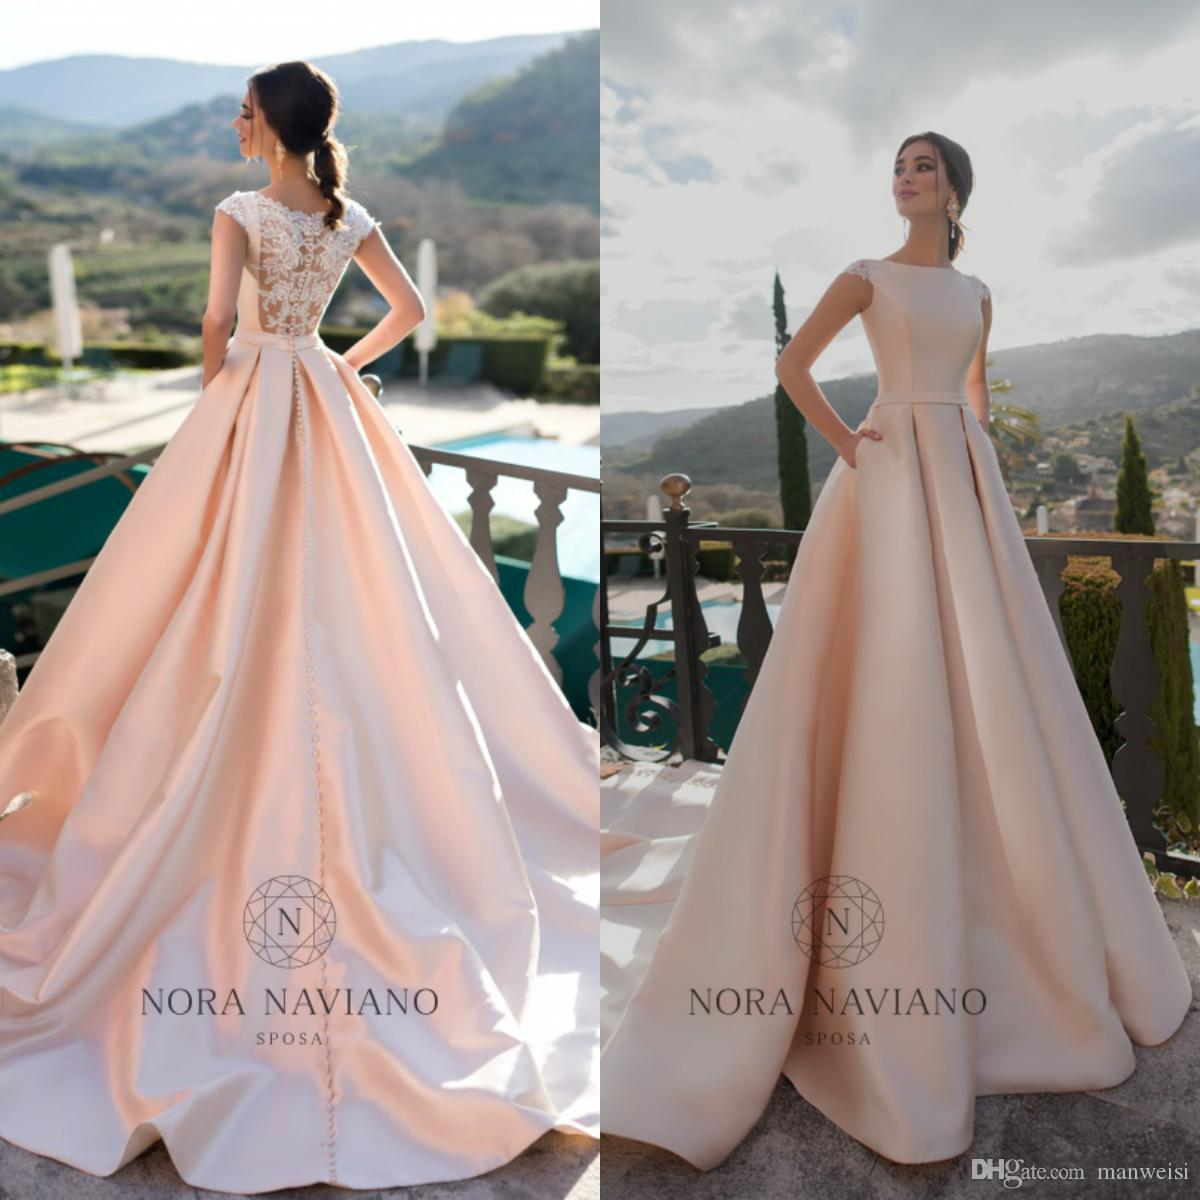 01f897f1bb640 Discount Nora Naviano 2019 A Line Satin Wedding Dresses Lace Applique Cap  Sleeve Sweep Train Blush Pink Bridal Gowns Plus Size Robe De Mariée  Designer ...